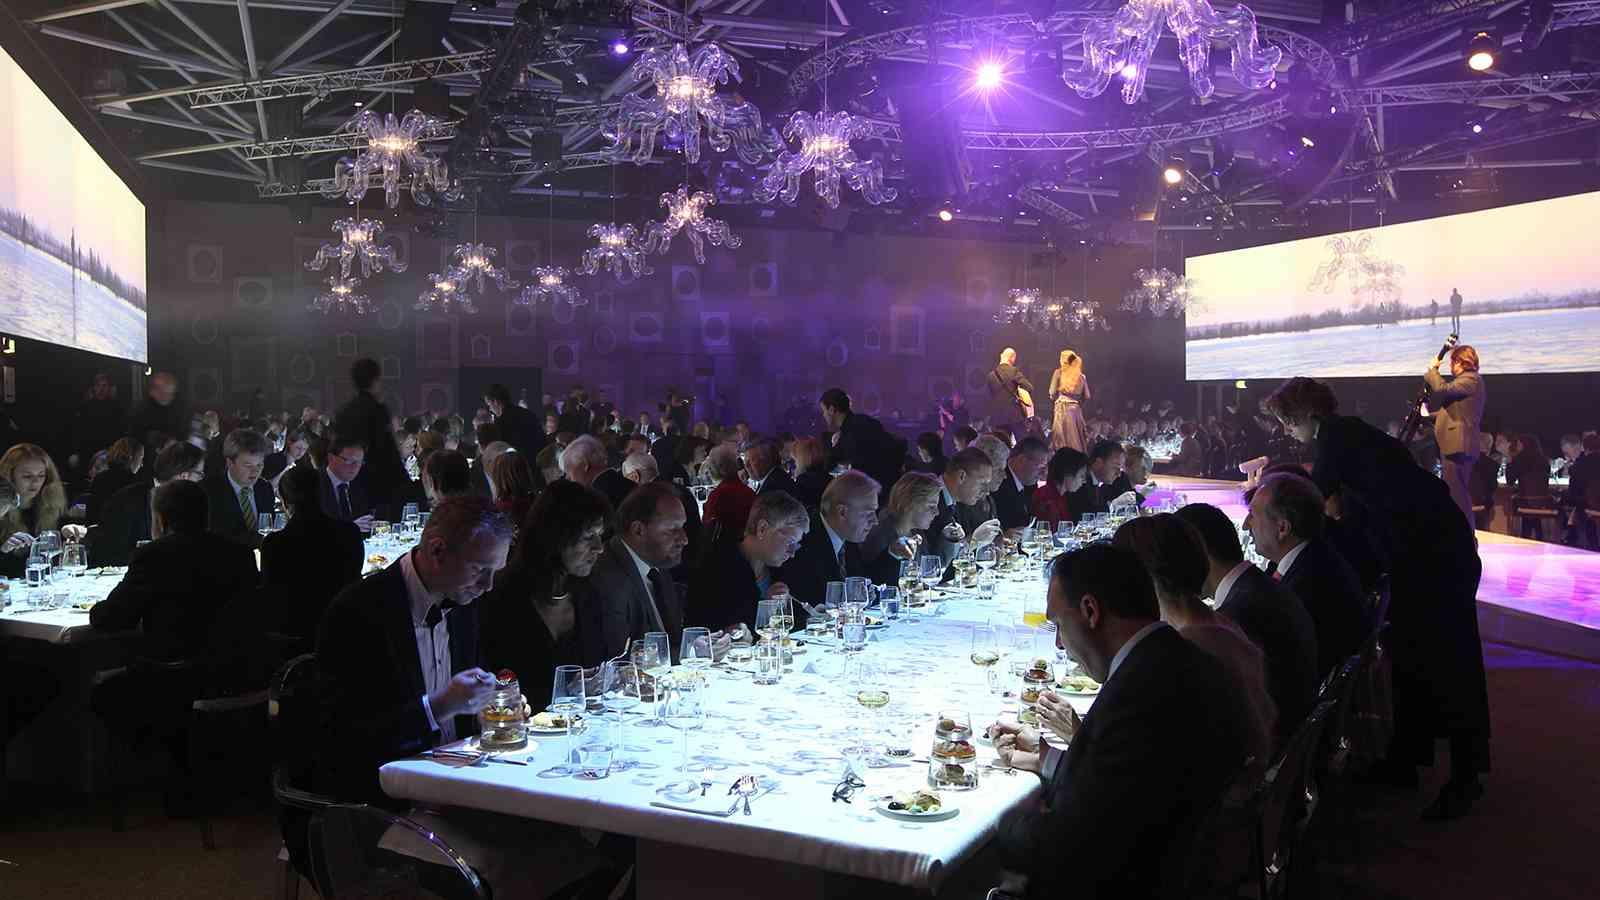 video-mapping_gala-dinner_vip-event_1600x900.jpg